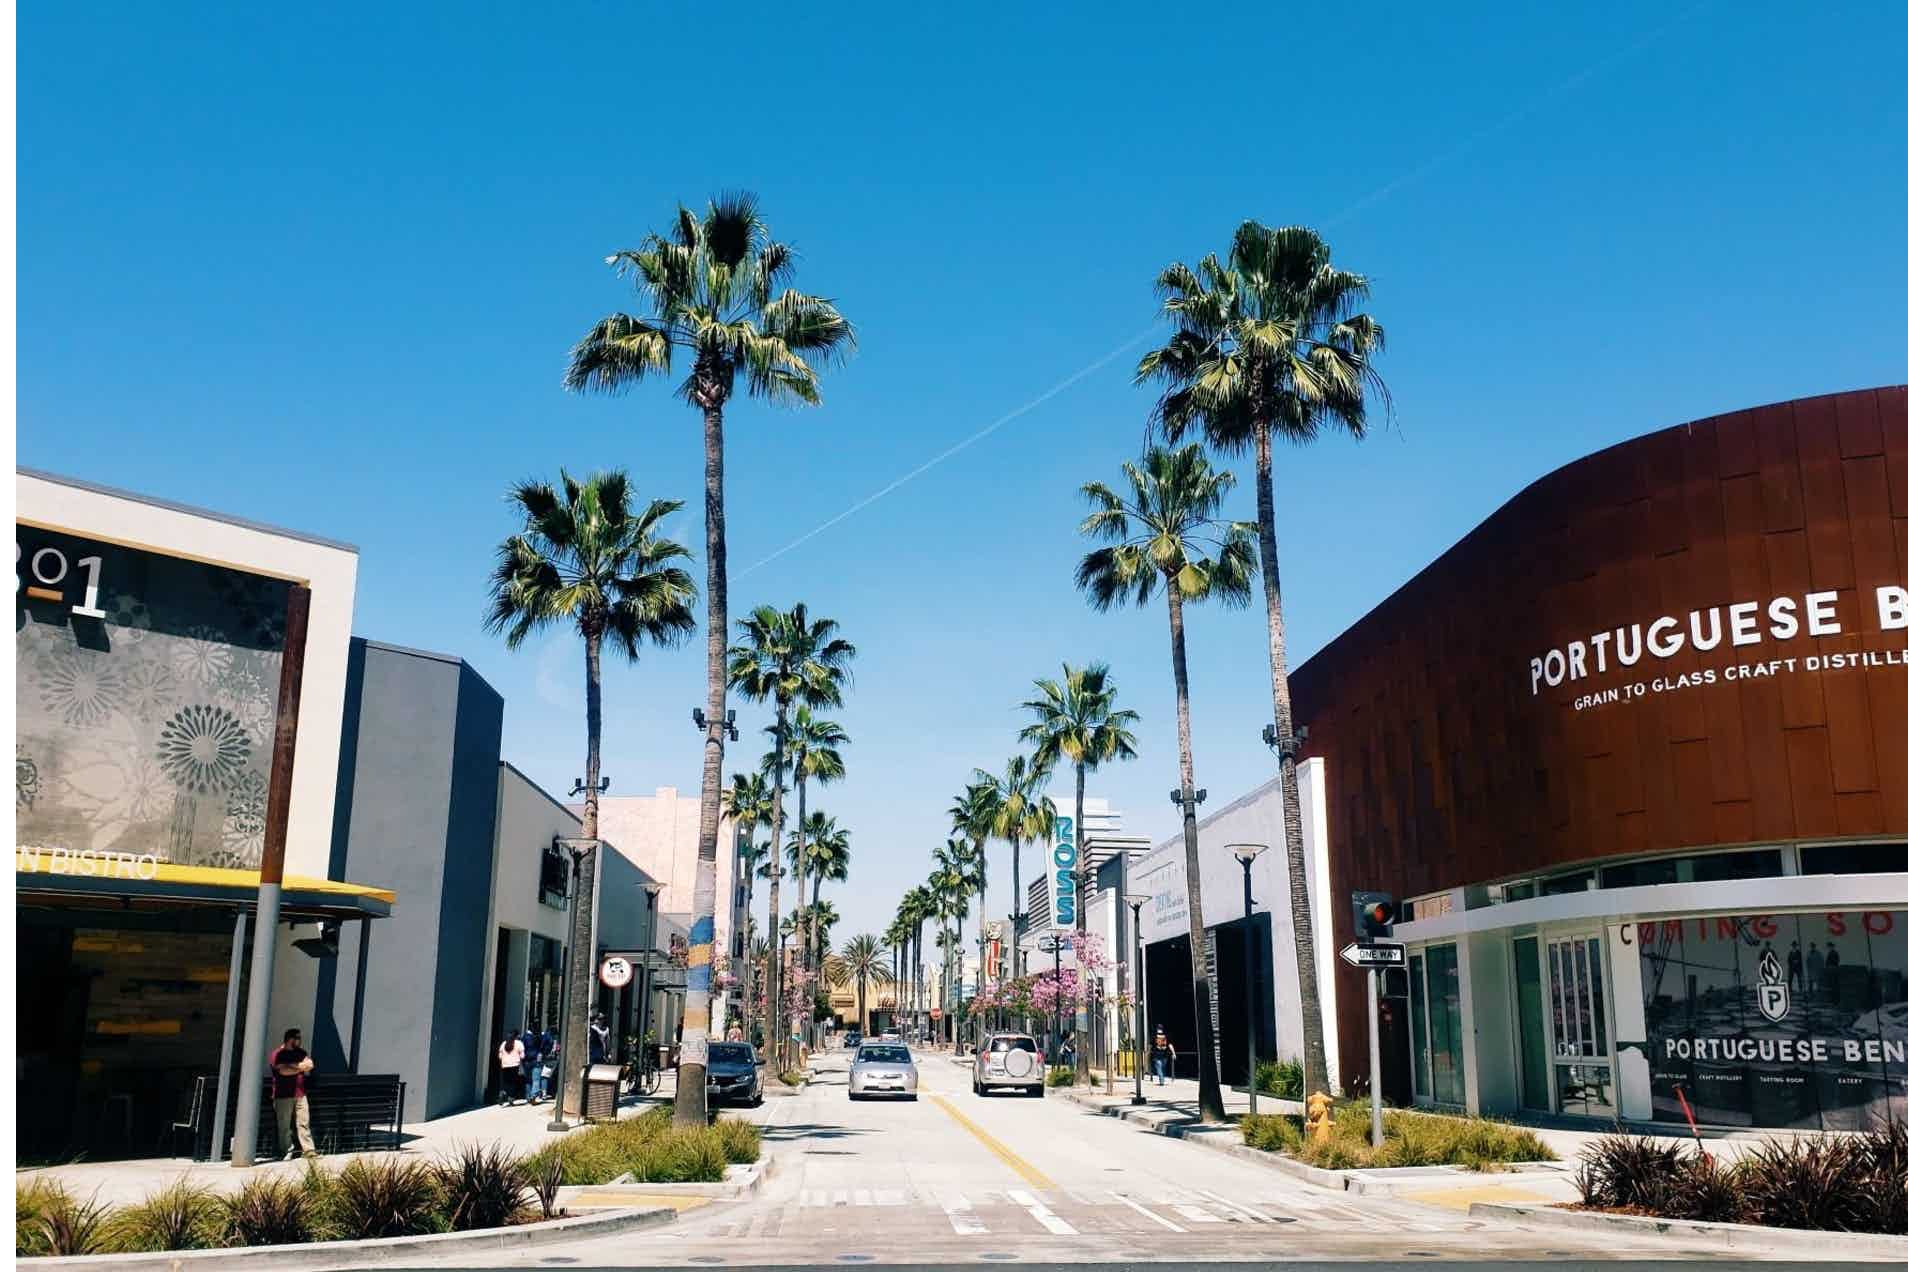 streets of the Promenade